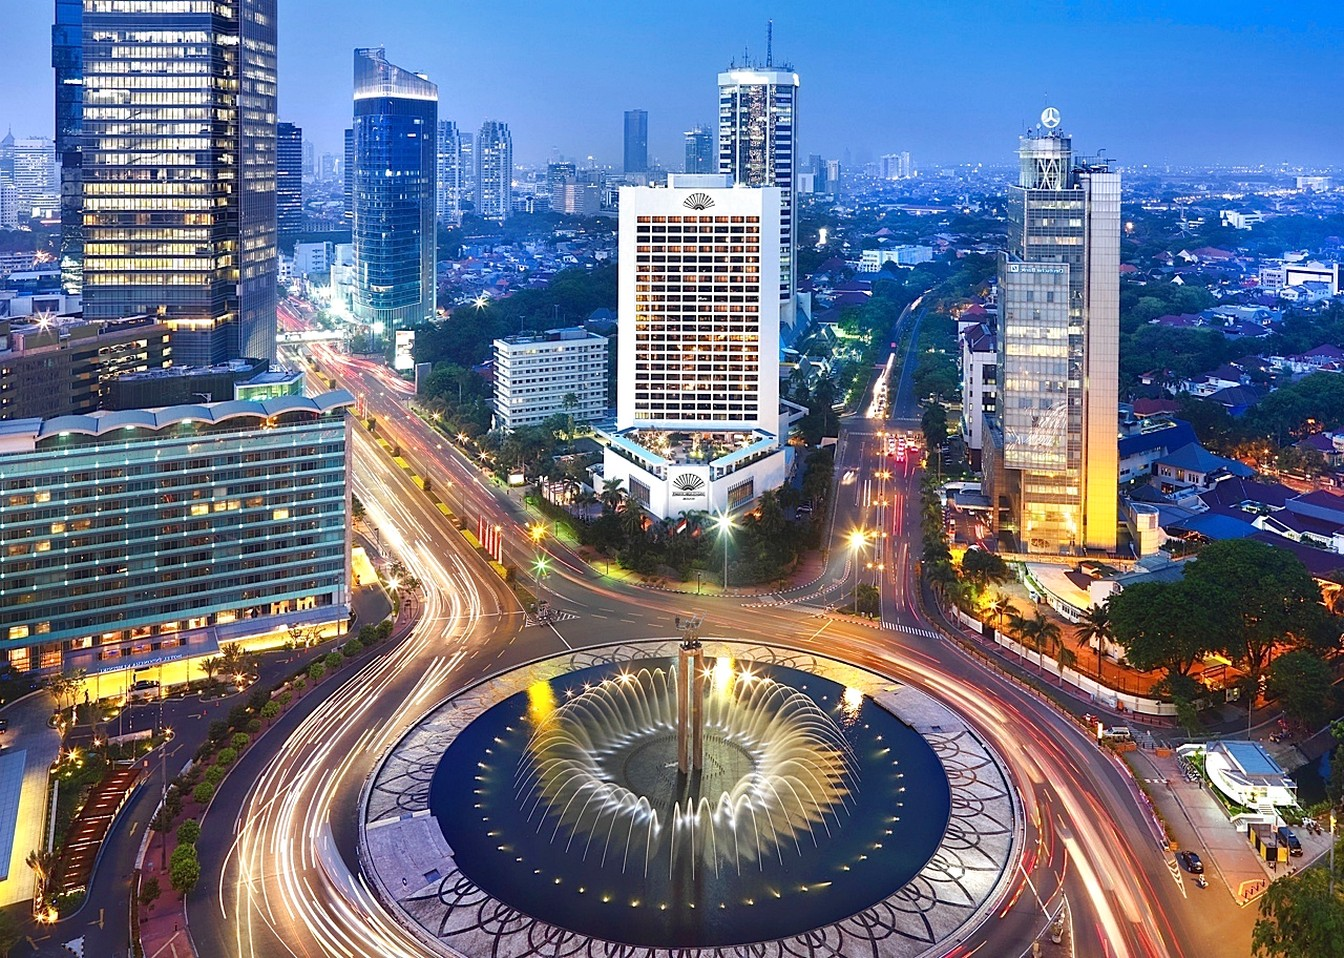 Indonesia City City of Indonesia Jakarta